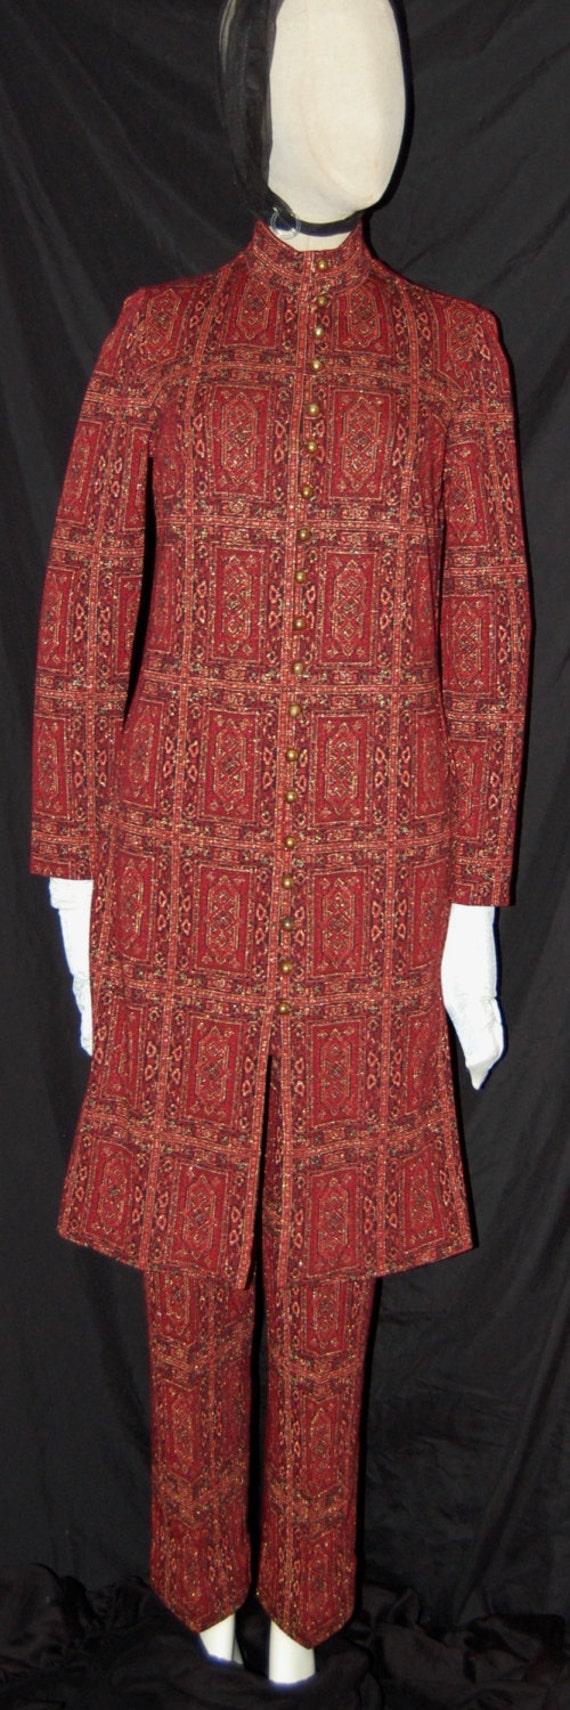 Vintage 60s festival pants set, carpet bag pattern